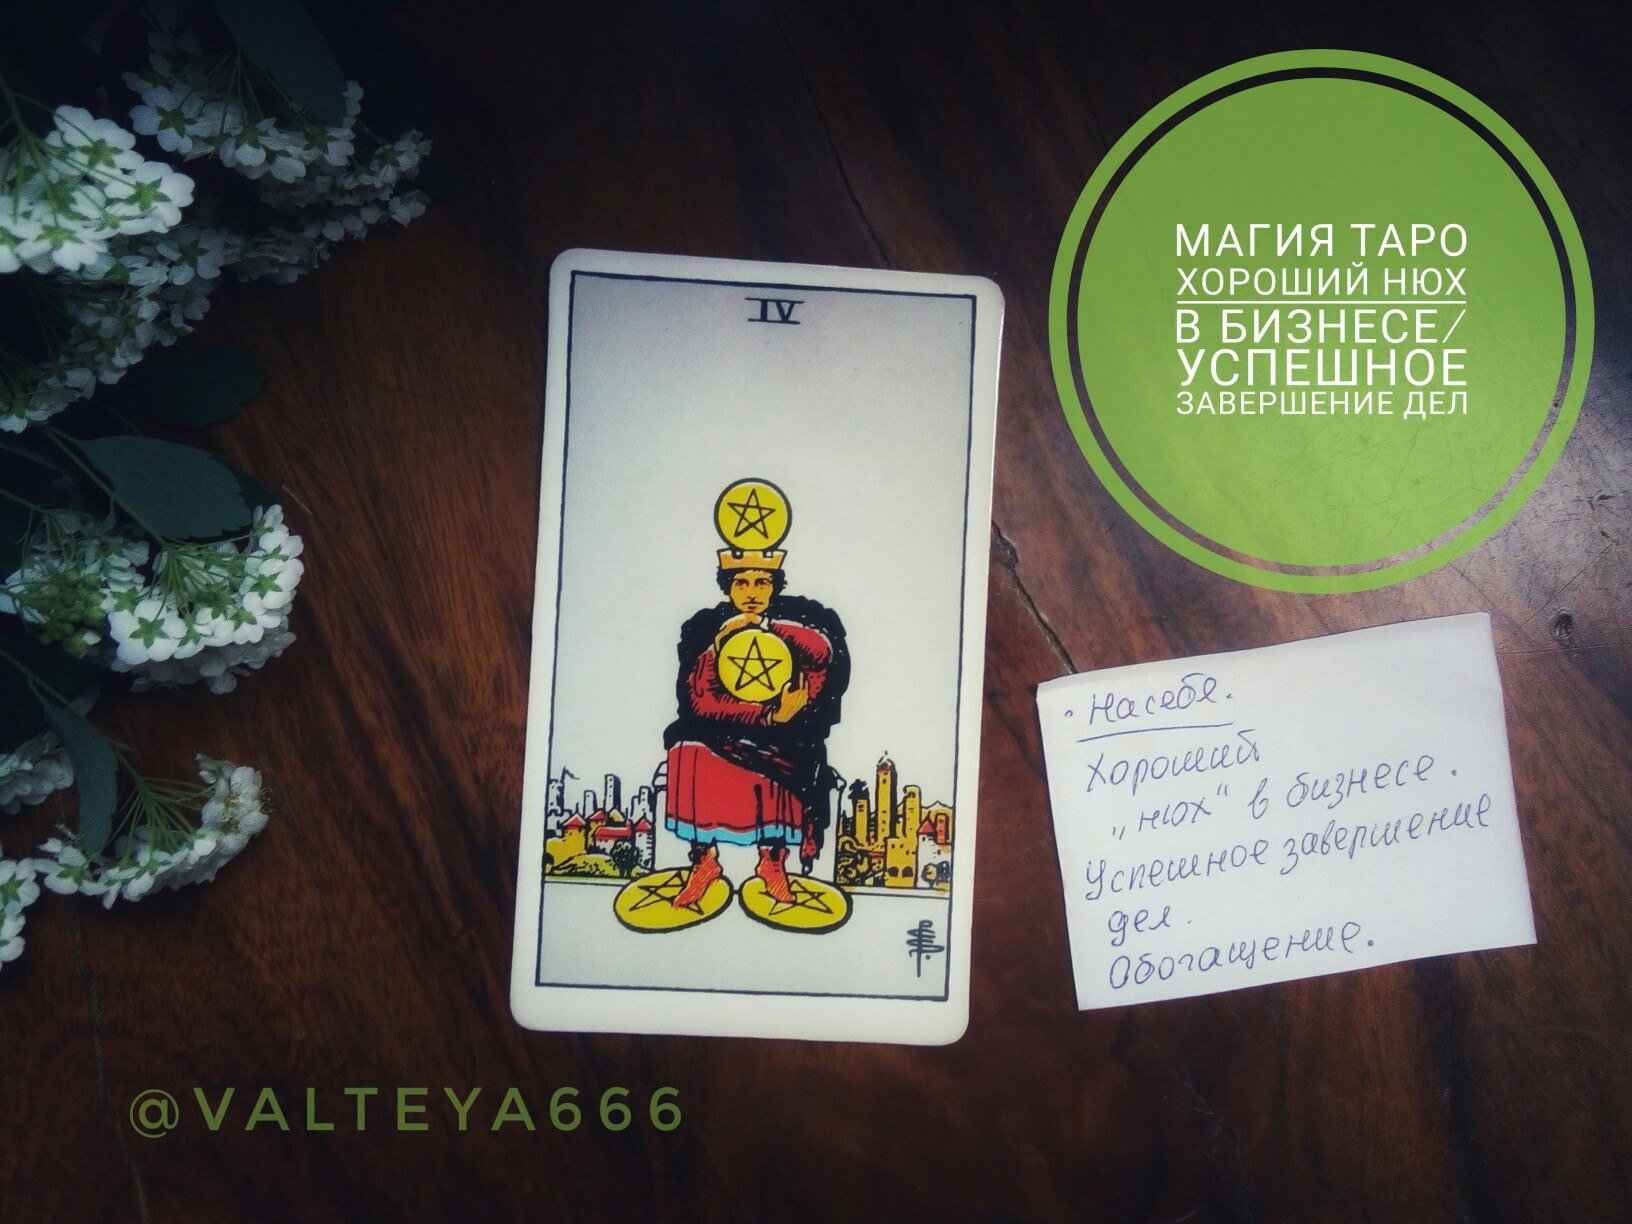 Хештег таро на   Салон Магии и мистики Елены Руденко ( Валтеи ). Киев ,тел: 0506251562  DC8qUYWTRN8